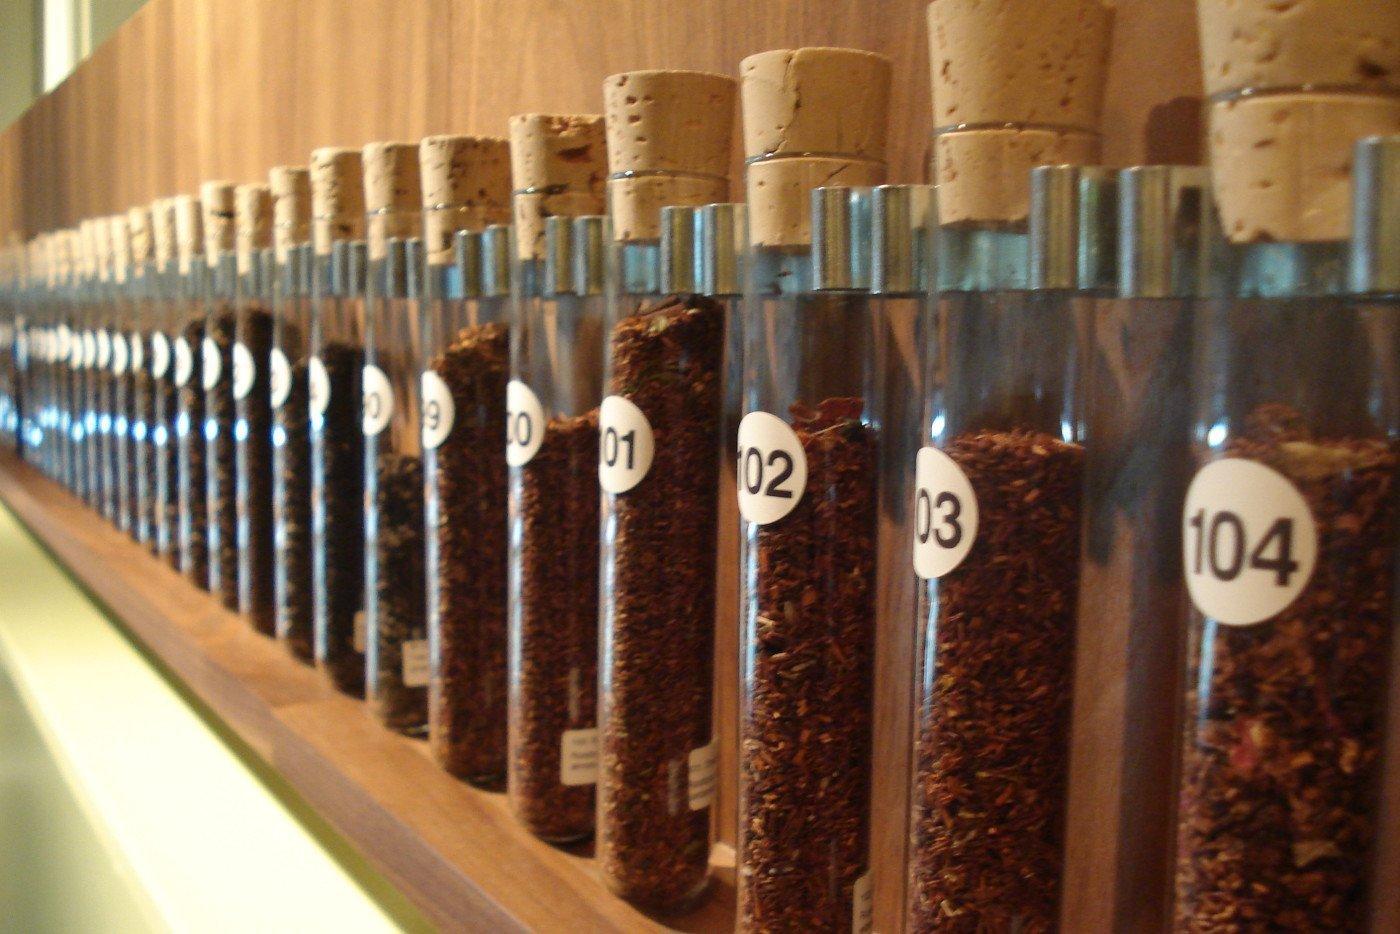 Remedy Tea Test tubes. Photo via Flickr Creative Commons by Bridget Coila